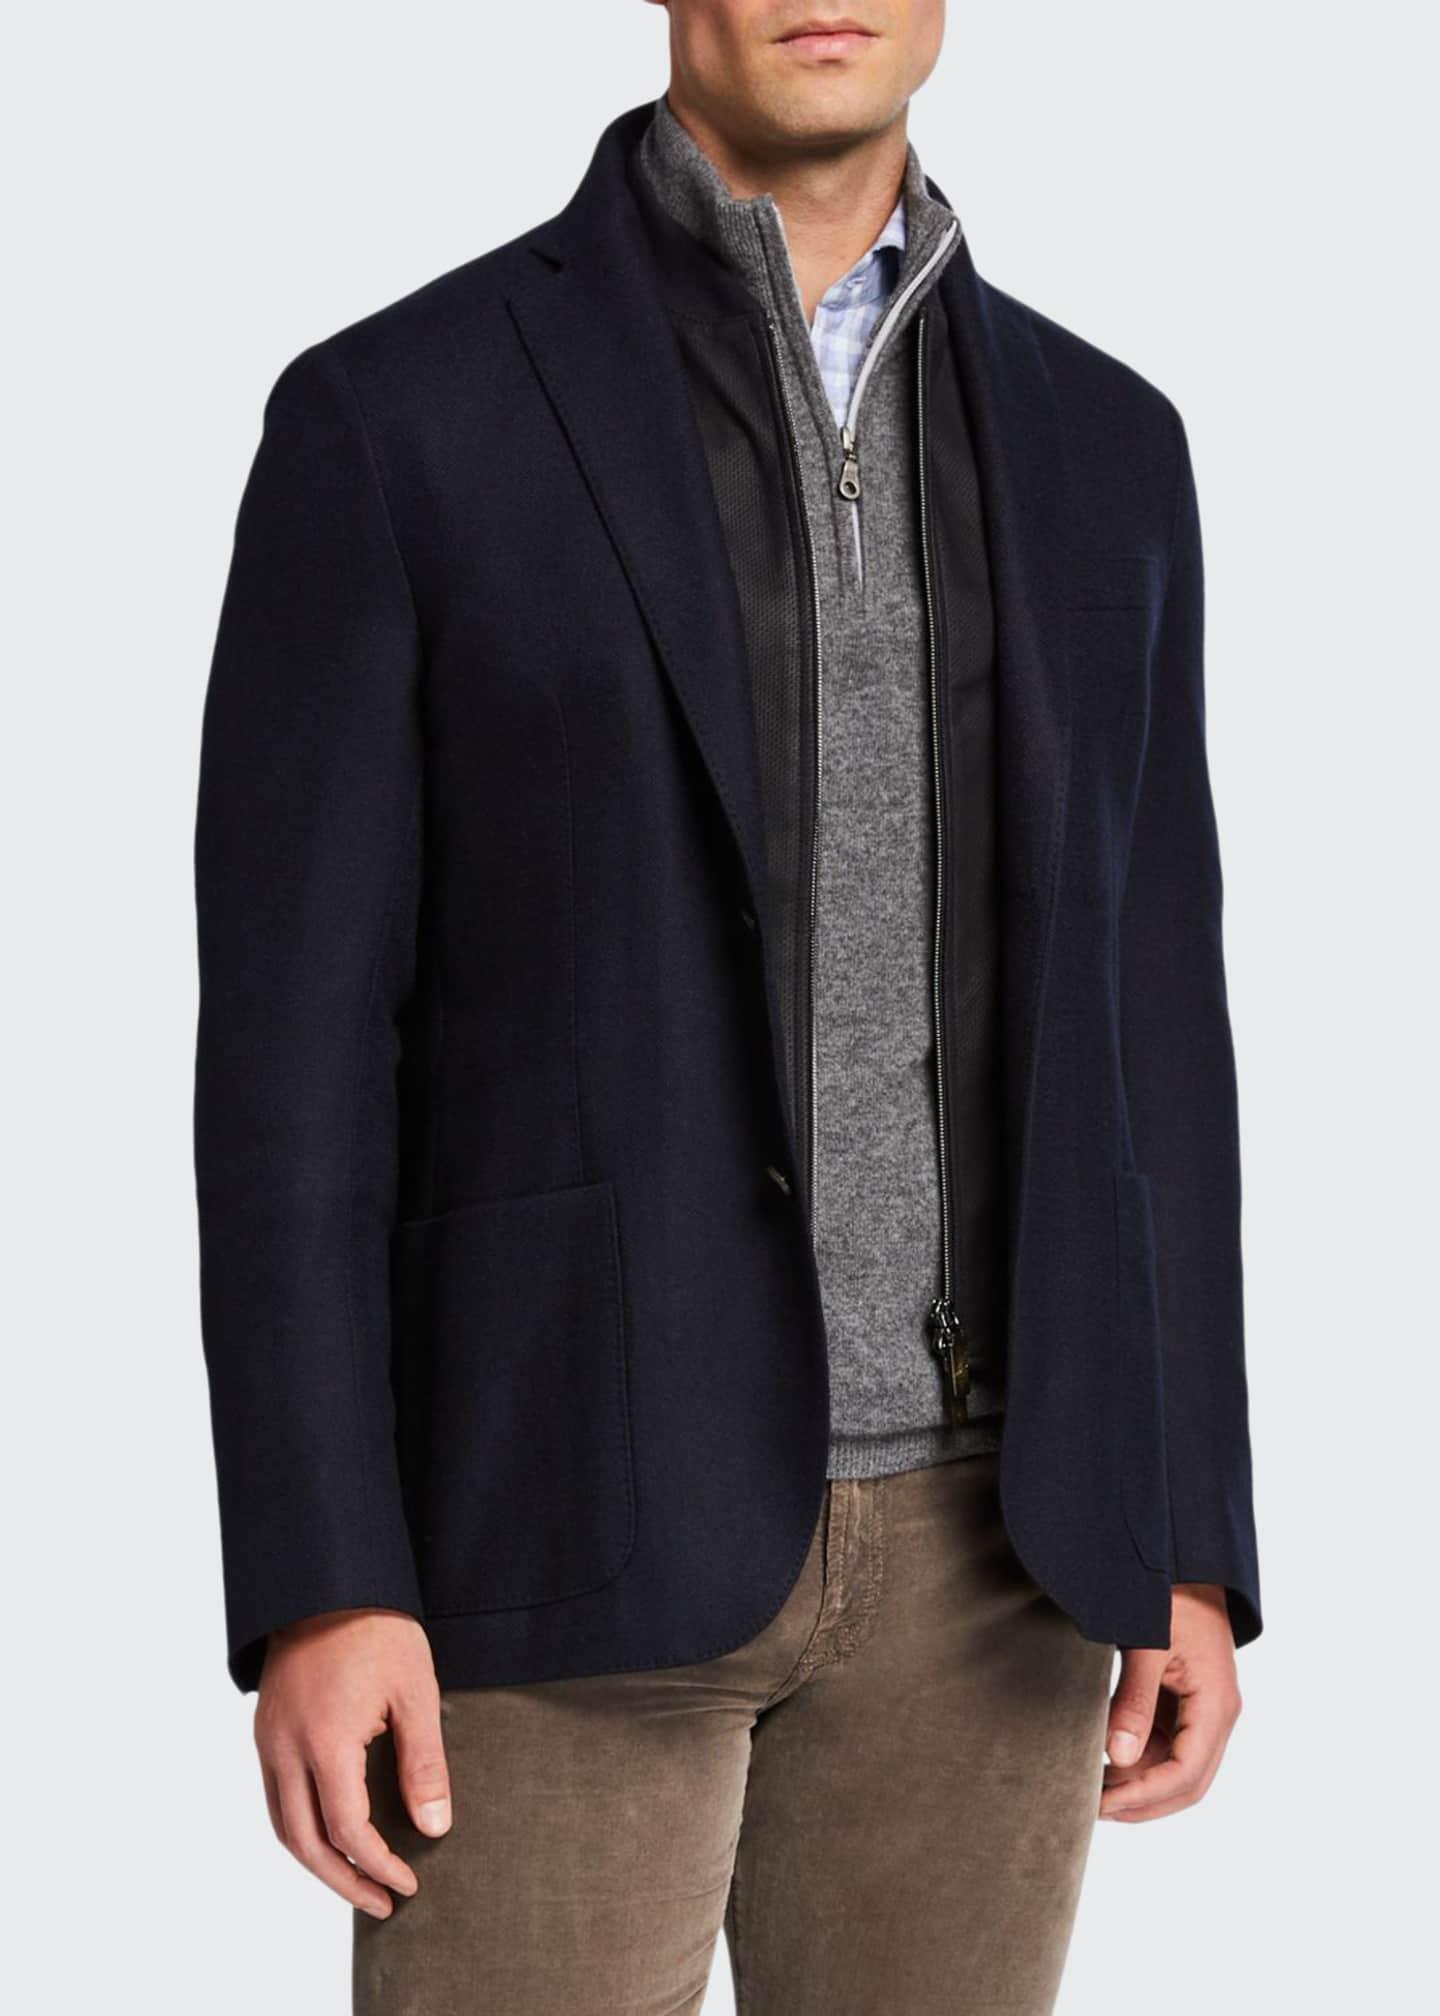 Corneliani Men's Herringbone Soft Jacket w/ Suede Dickey